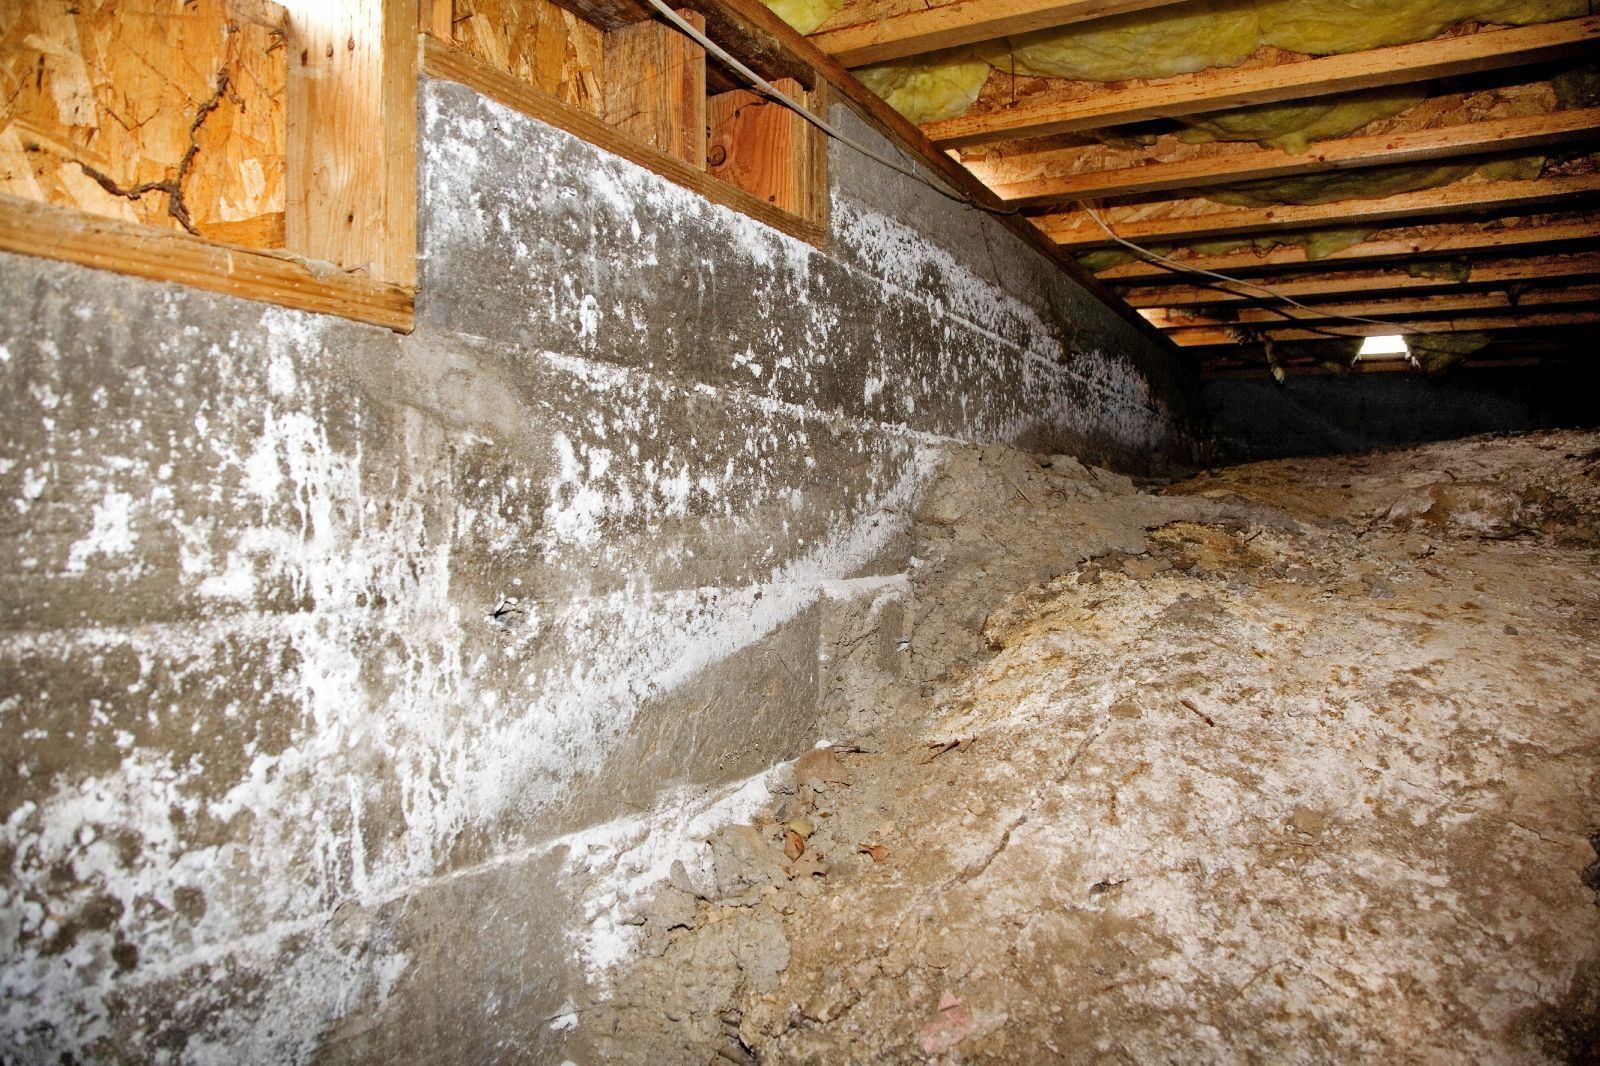 Mold Damage Repair Remediation Scavello Restoration Services Crawl Space Repair Mold In Basement Water Damage Repair